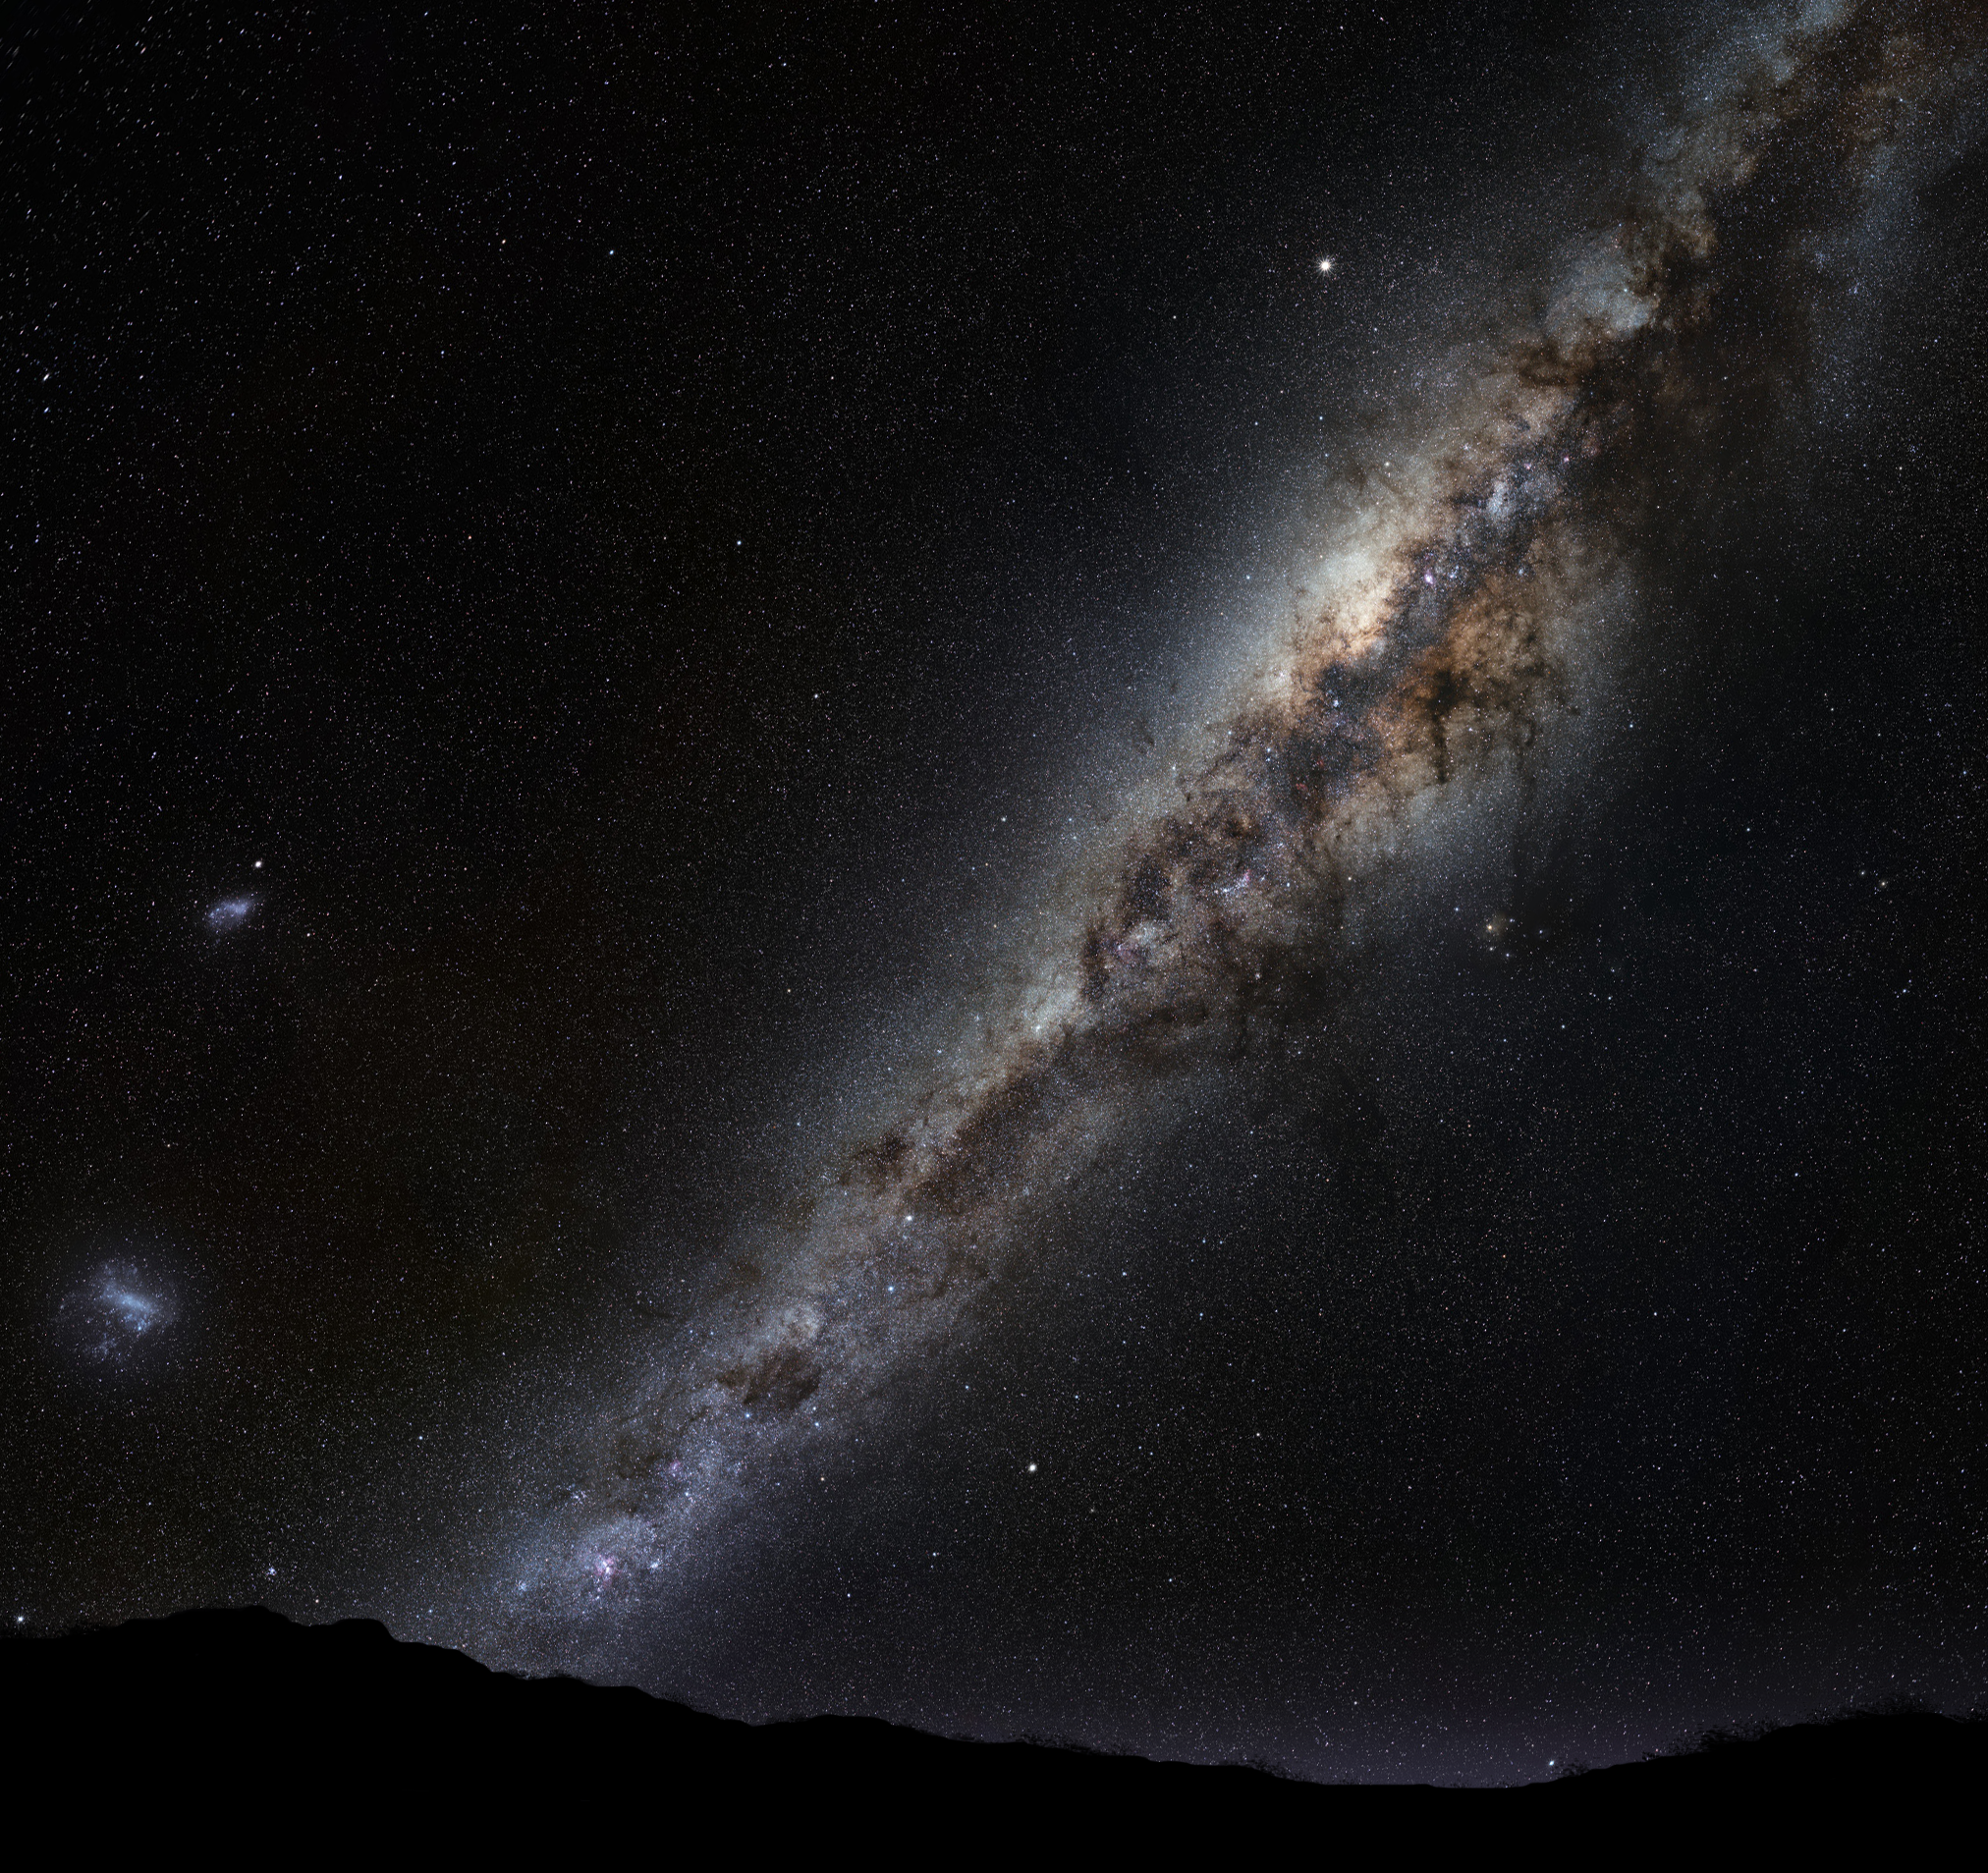 Milky Way Wallpaper: Milky Way Photoshop Hd Background Wallpaper 20 HD